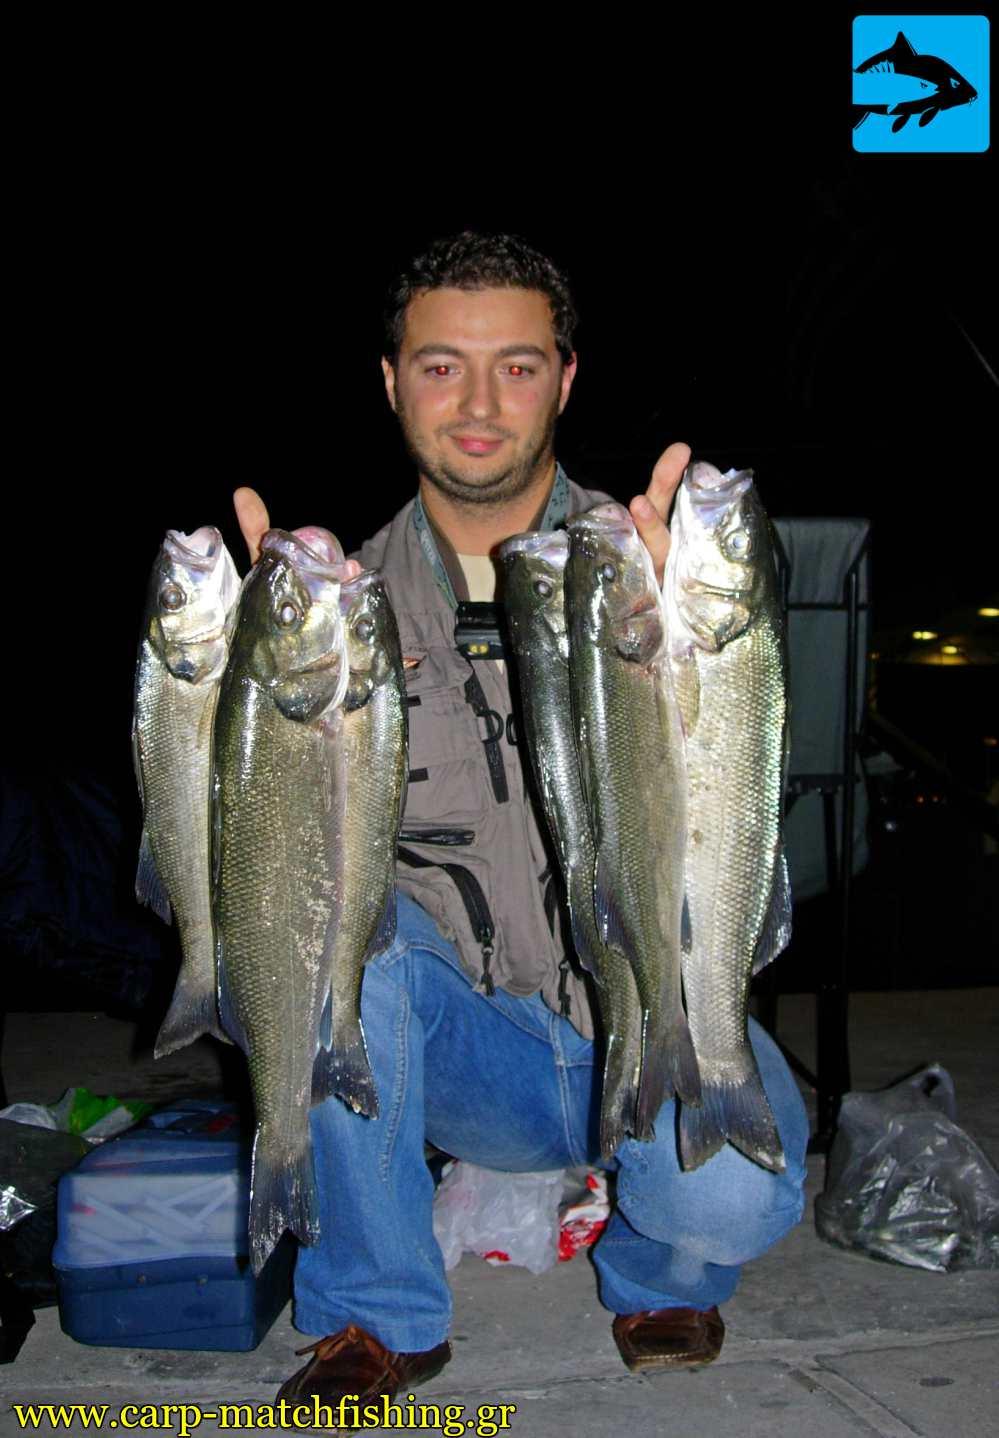 lavrakia me zontani garida me match fishing carpmatchfishing